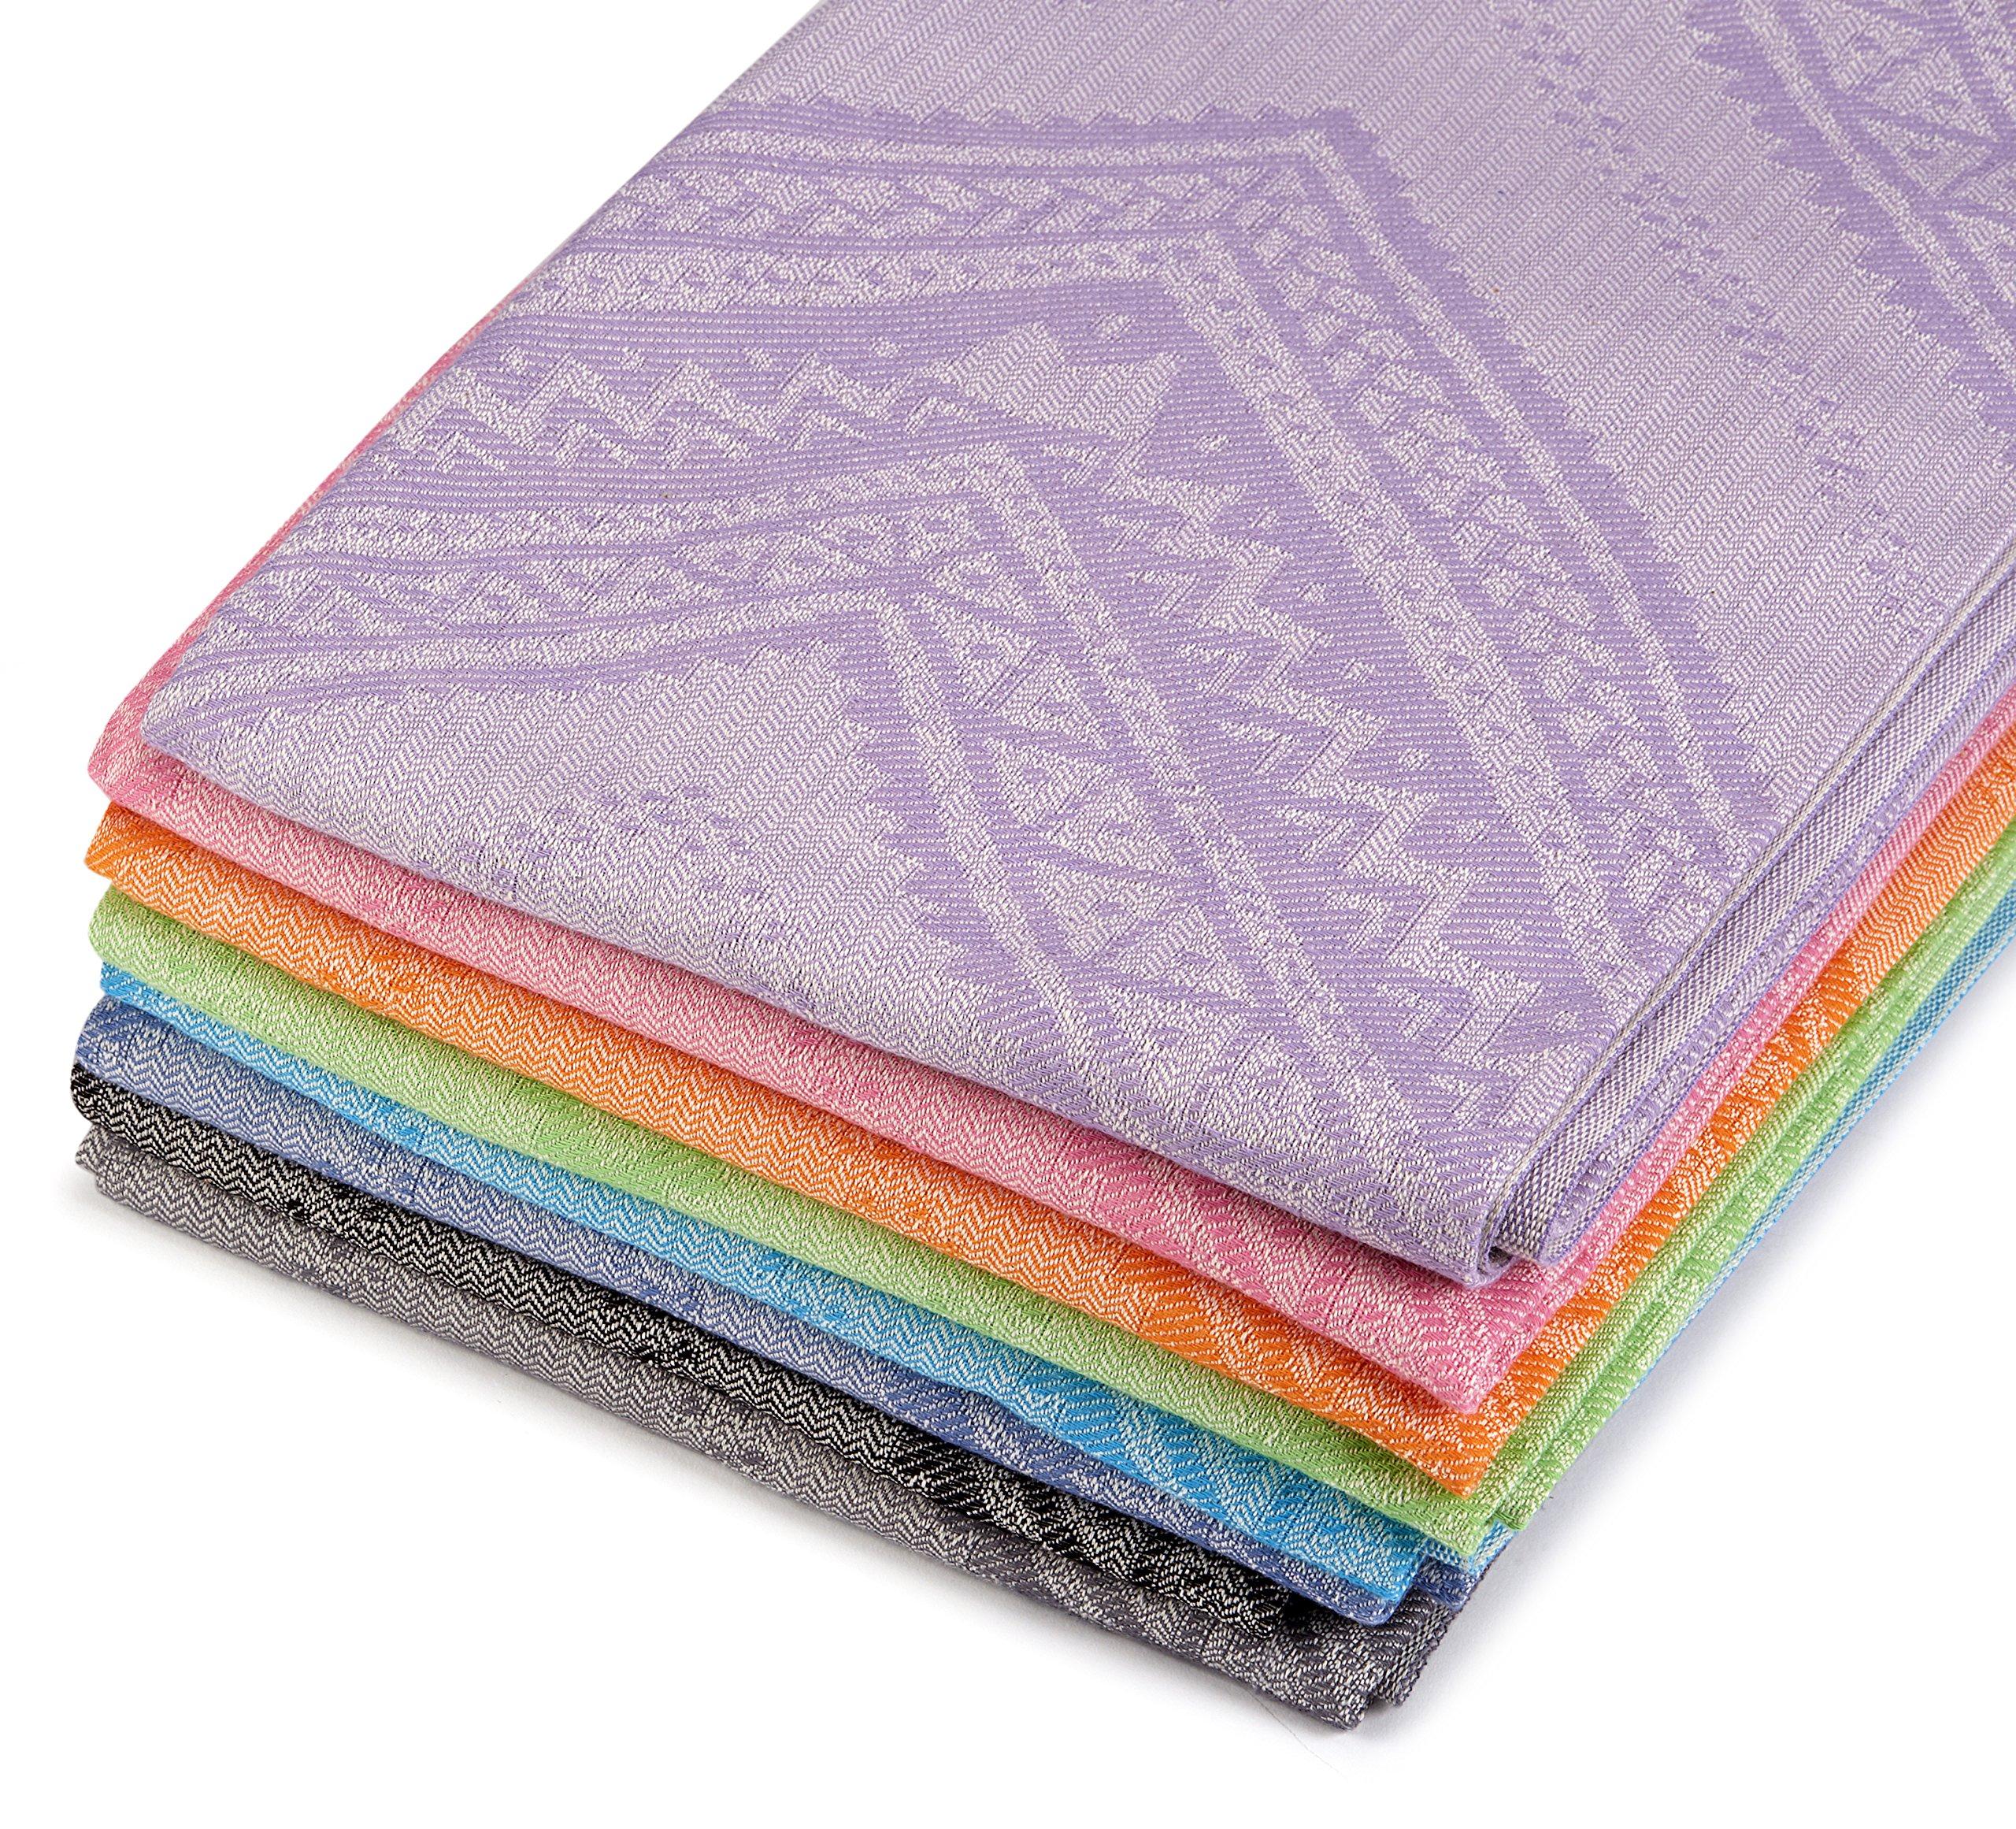 Lushrobe Peshtemal Beach Towel - colors